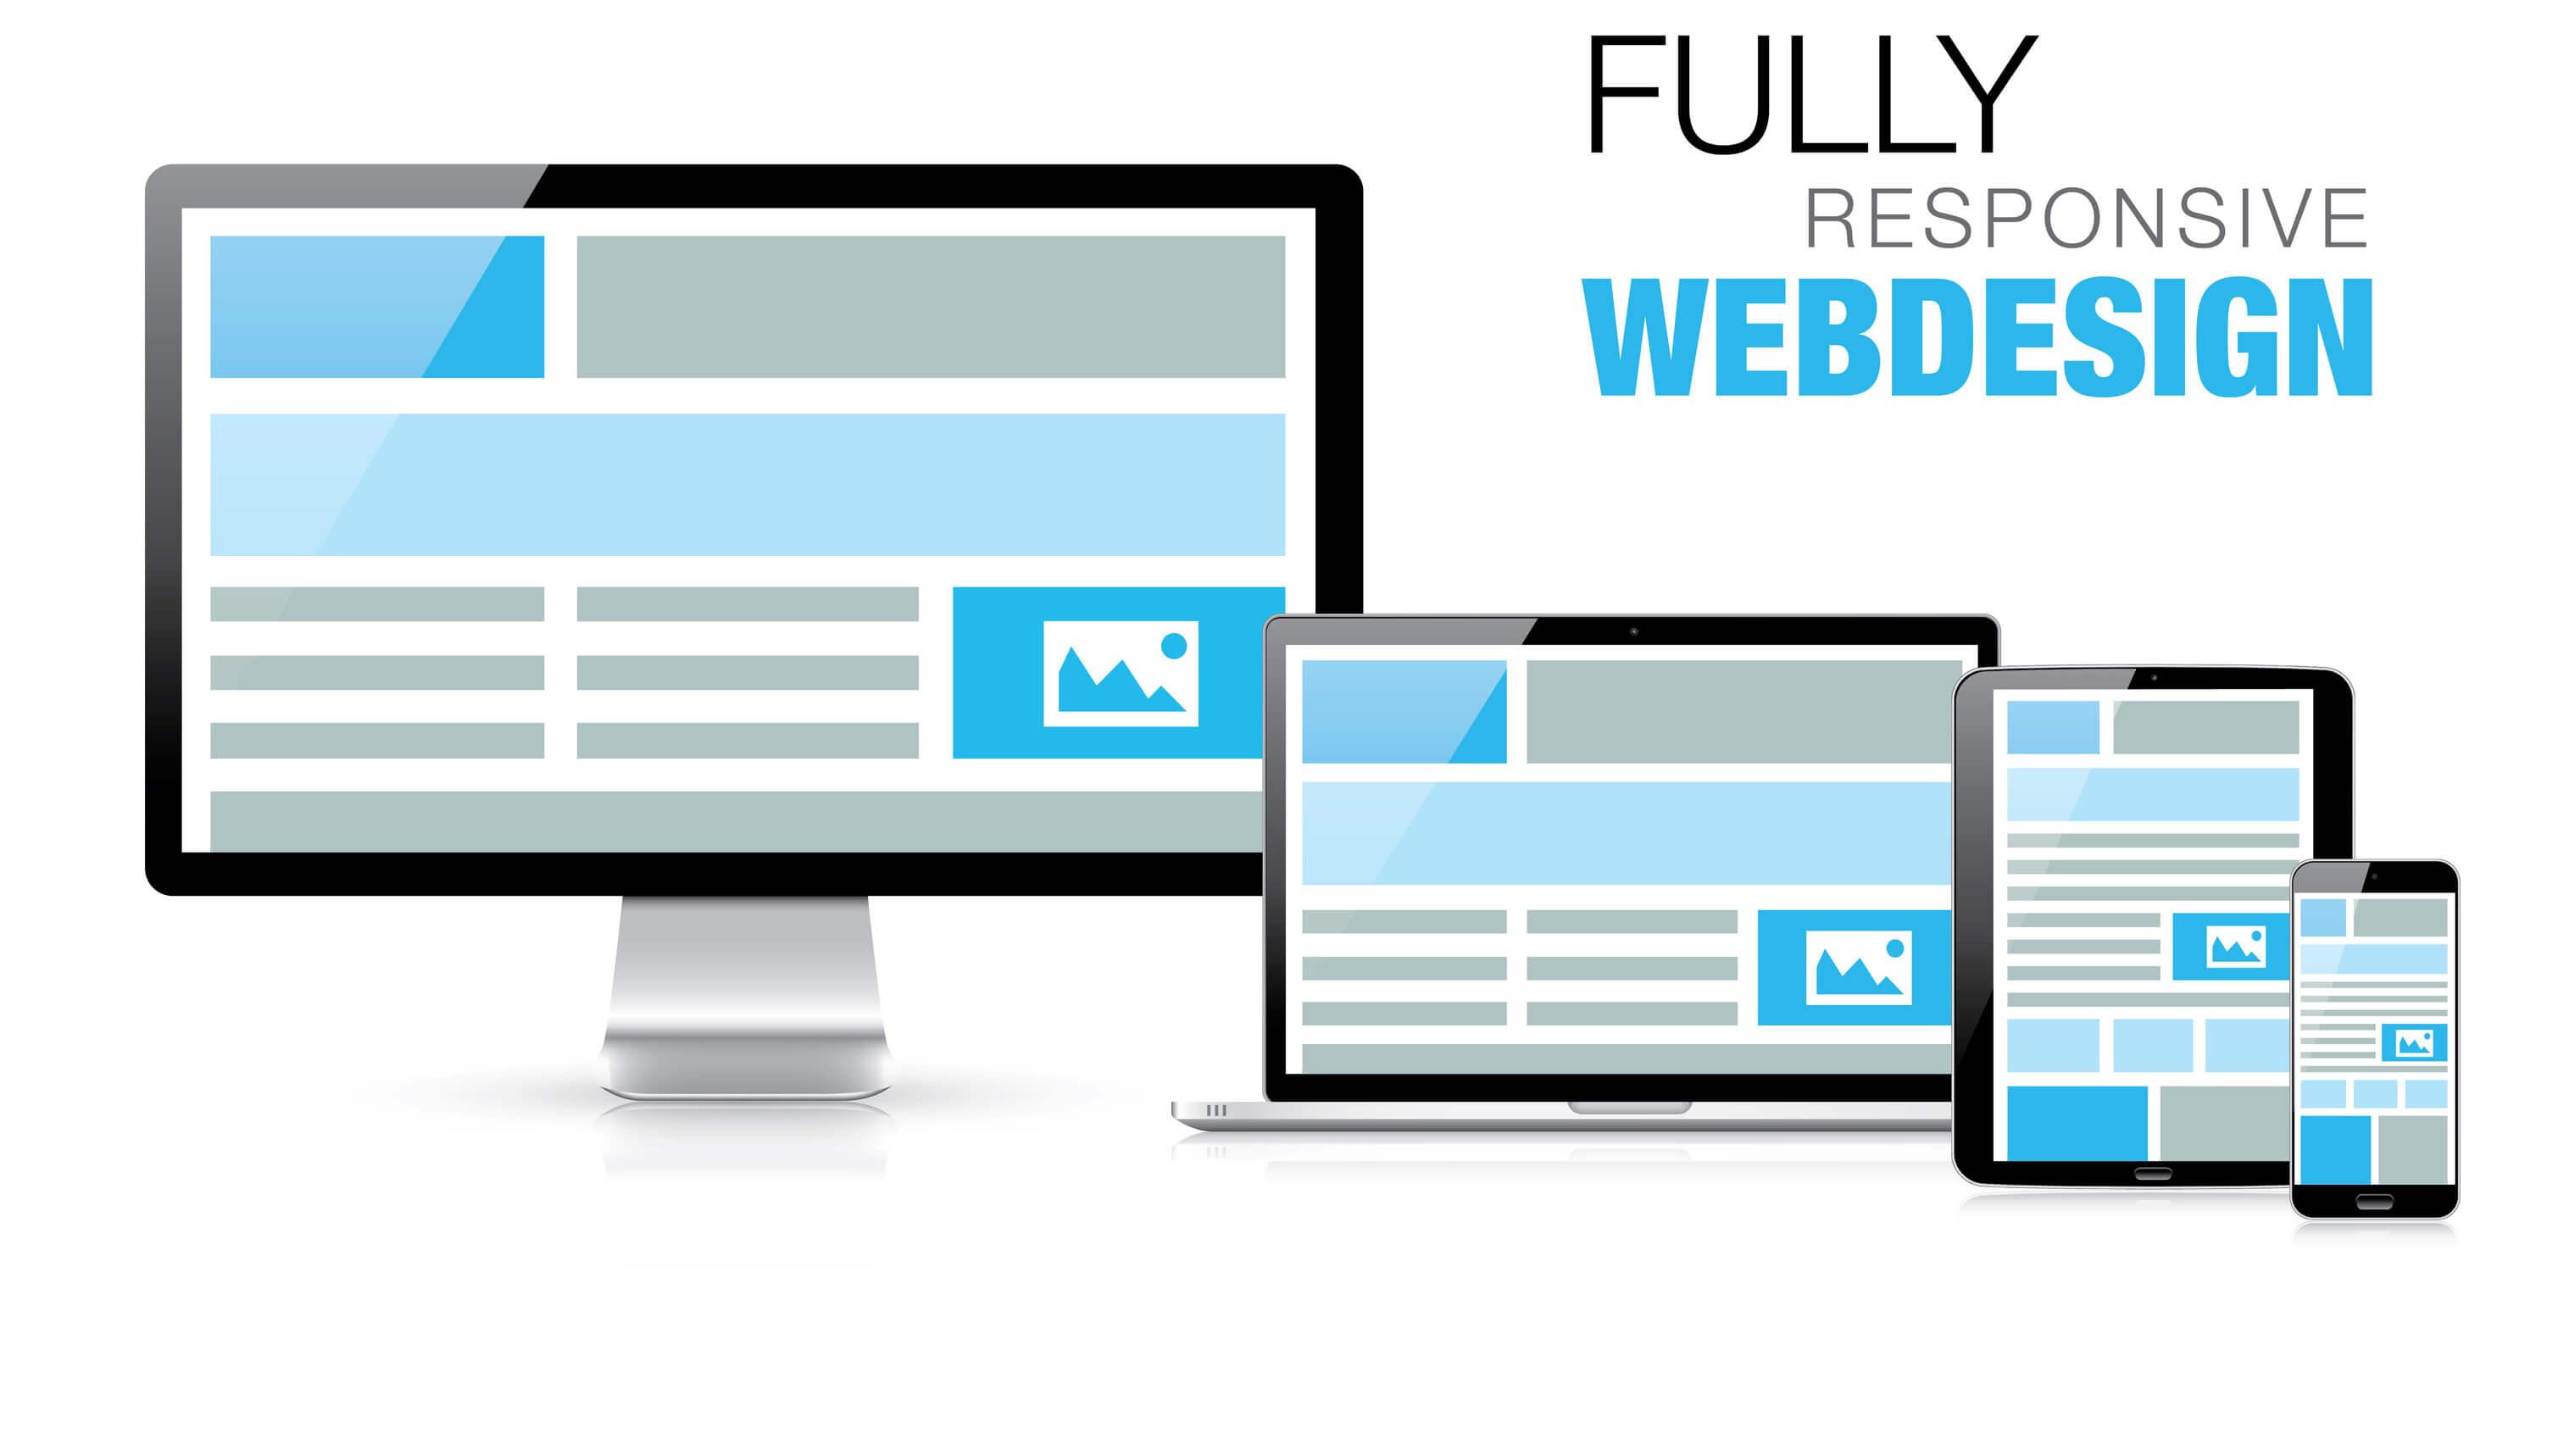 responsive-webdesign elements